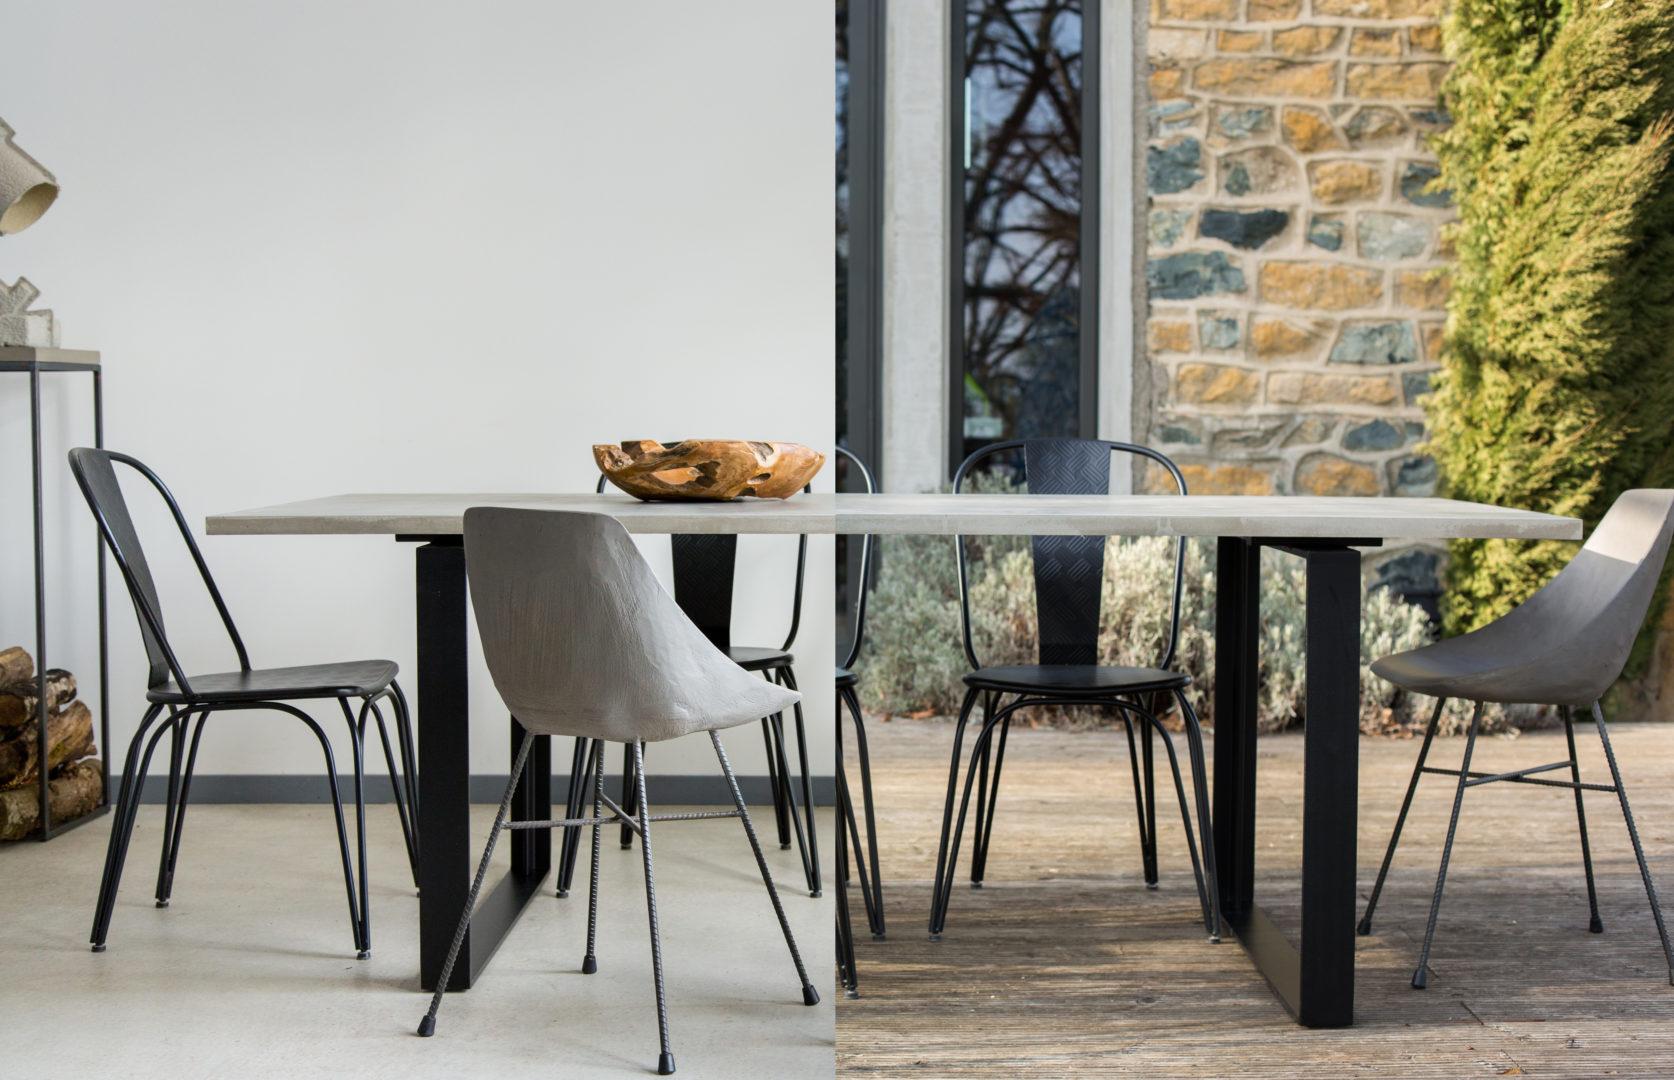 Table béton Interieur Exterieur- Alps - Dining Table - LYON BETON LINATELIER Nantes